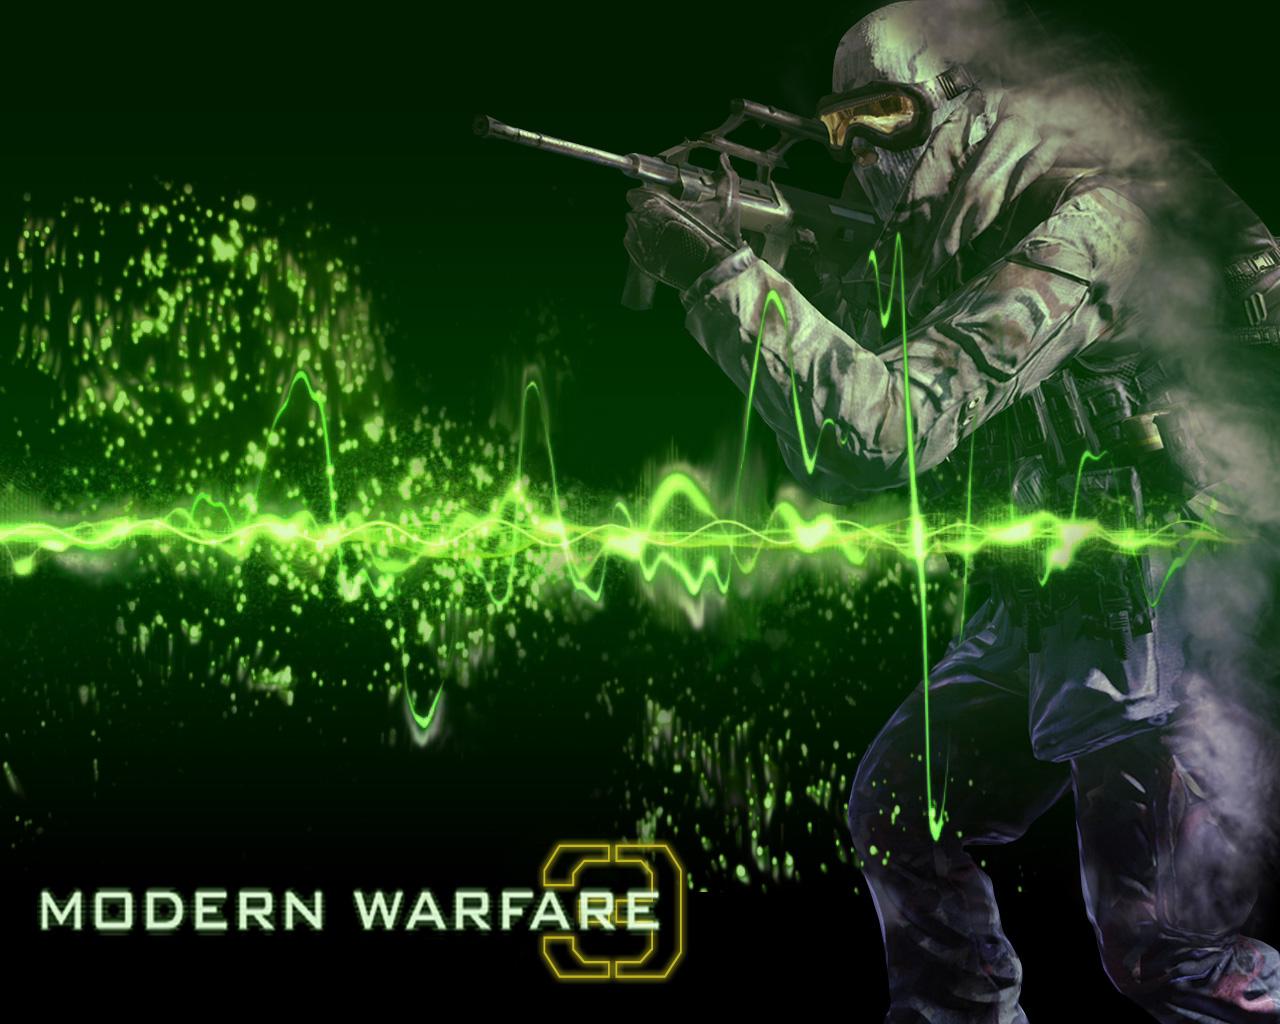 http://4.bp.blogspot.com/-m2It063d-vQ/TeS-8xjQ14I/AAAAAAAAAuY/fyQeCR5yknU/s1600/call_of_duty_mw3_Modern_Warfare.jpg